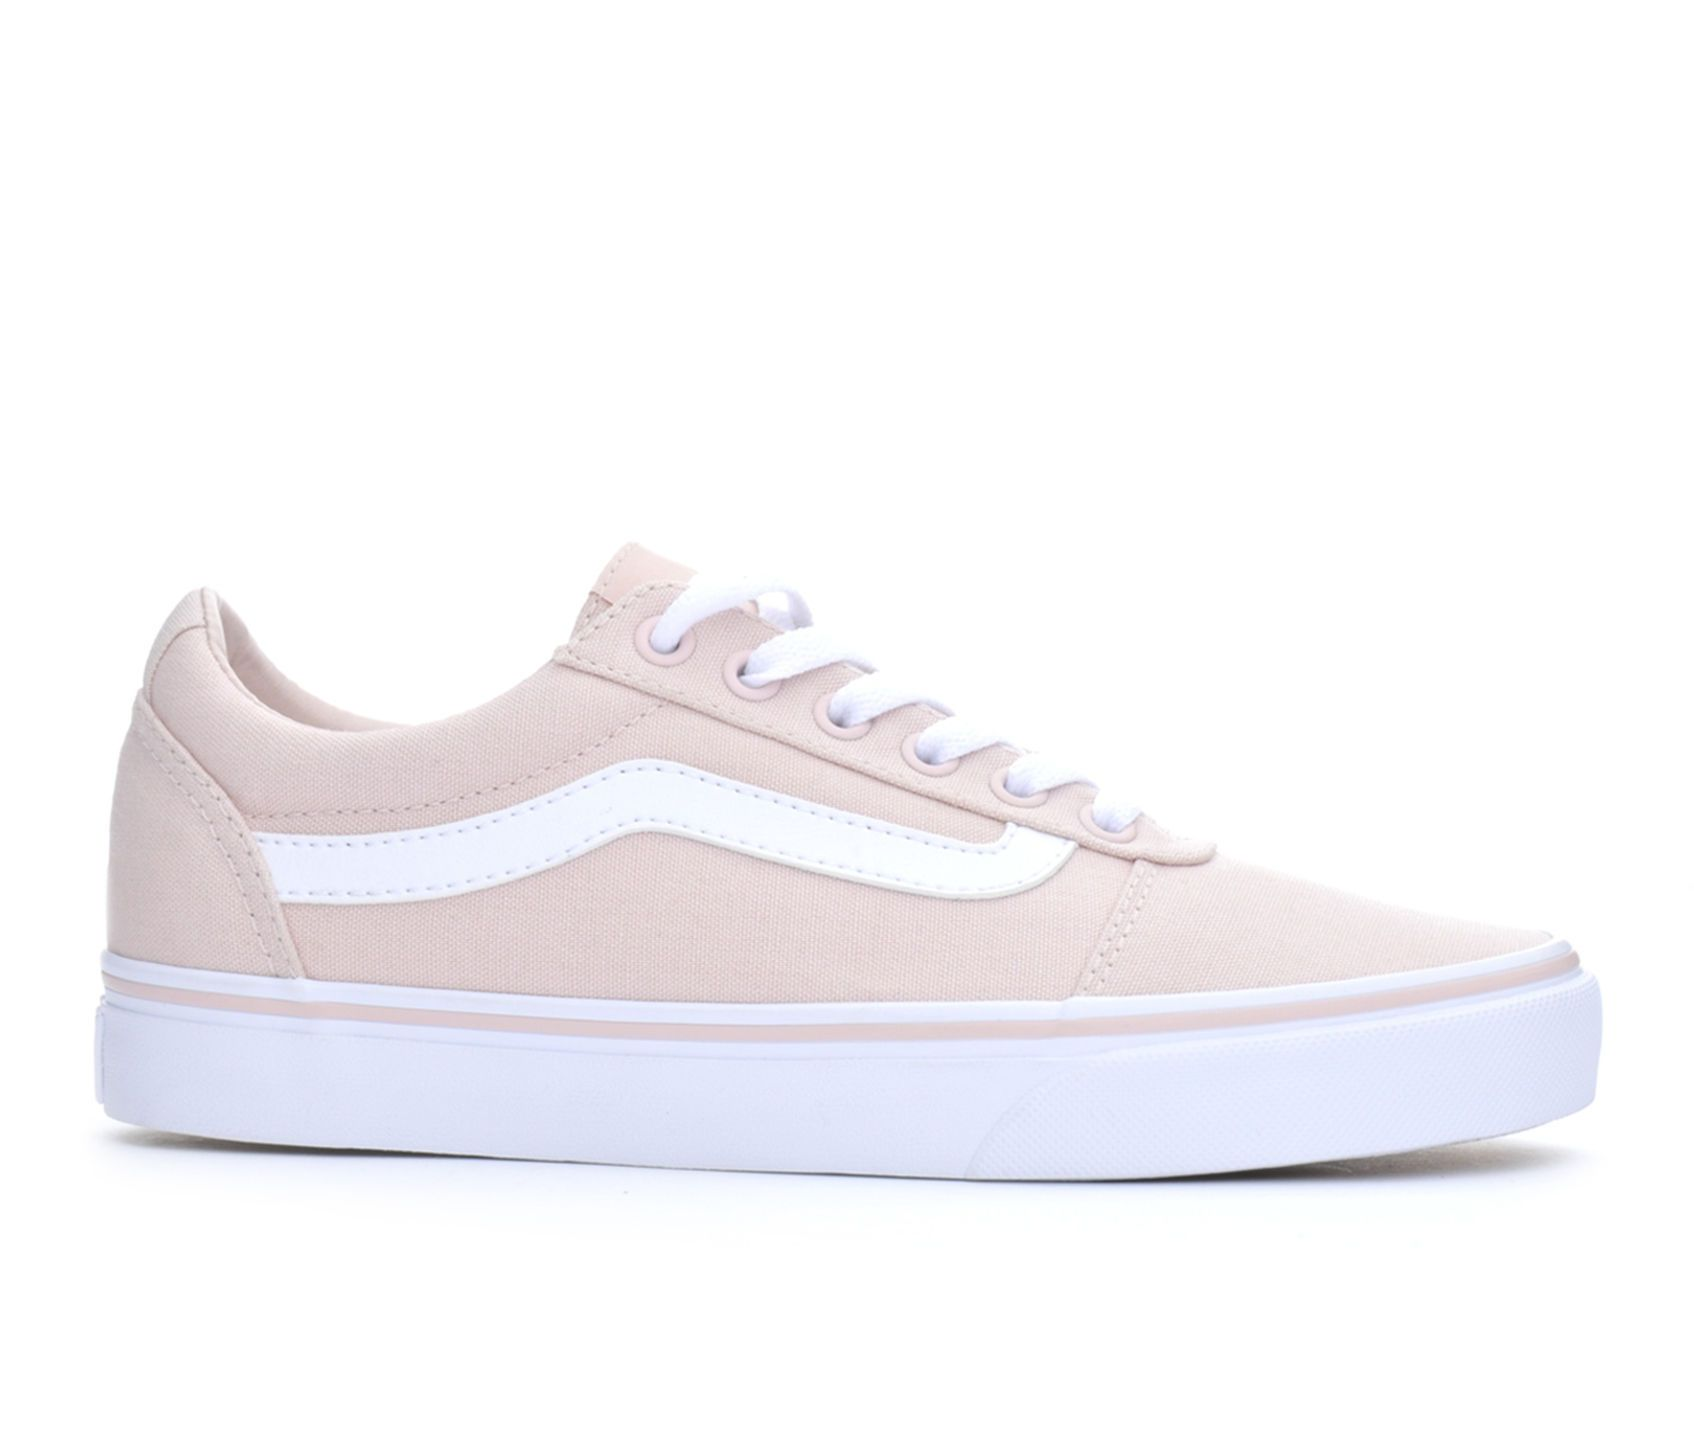 Women's Vans Ward Skate Shoes | Shoe